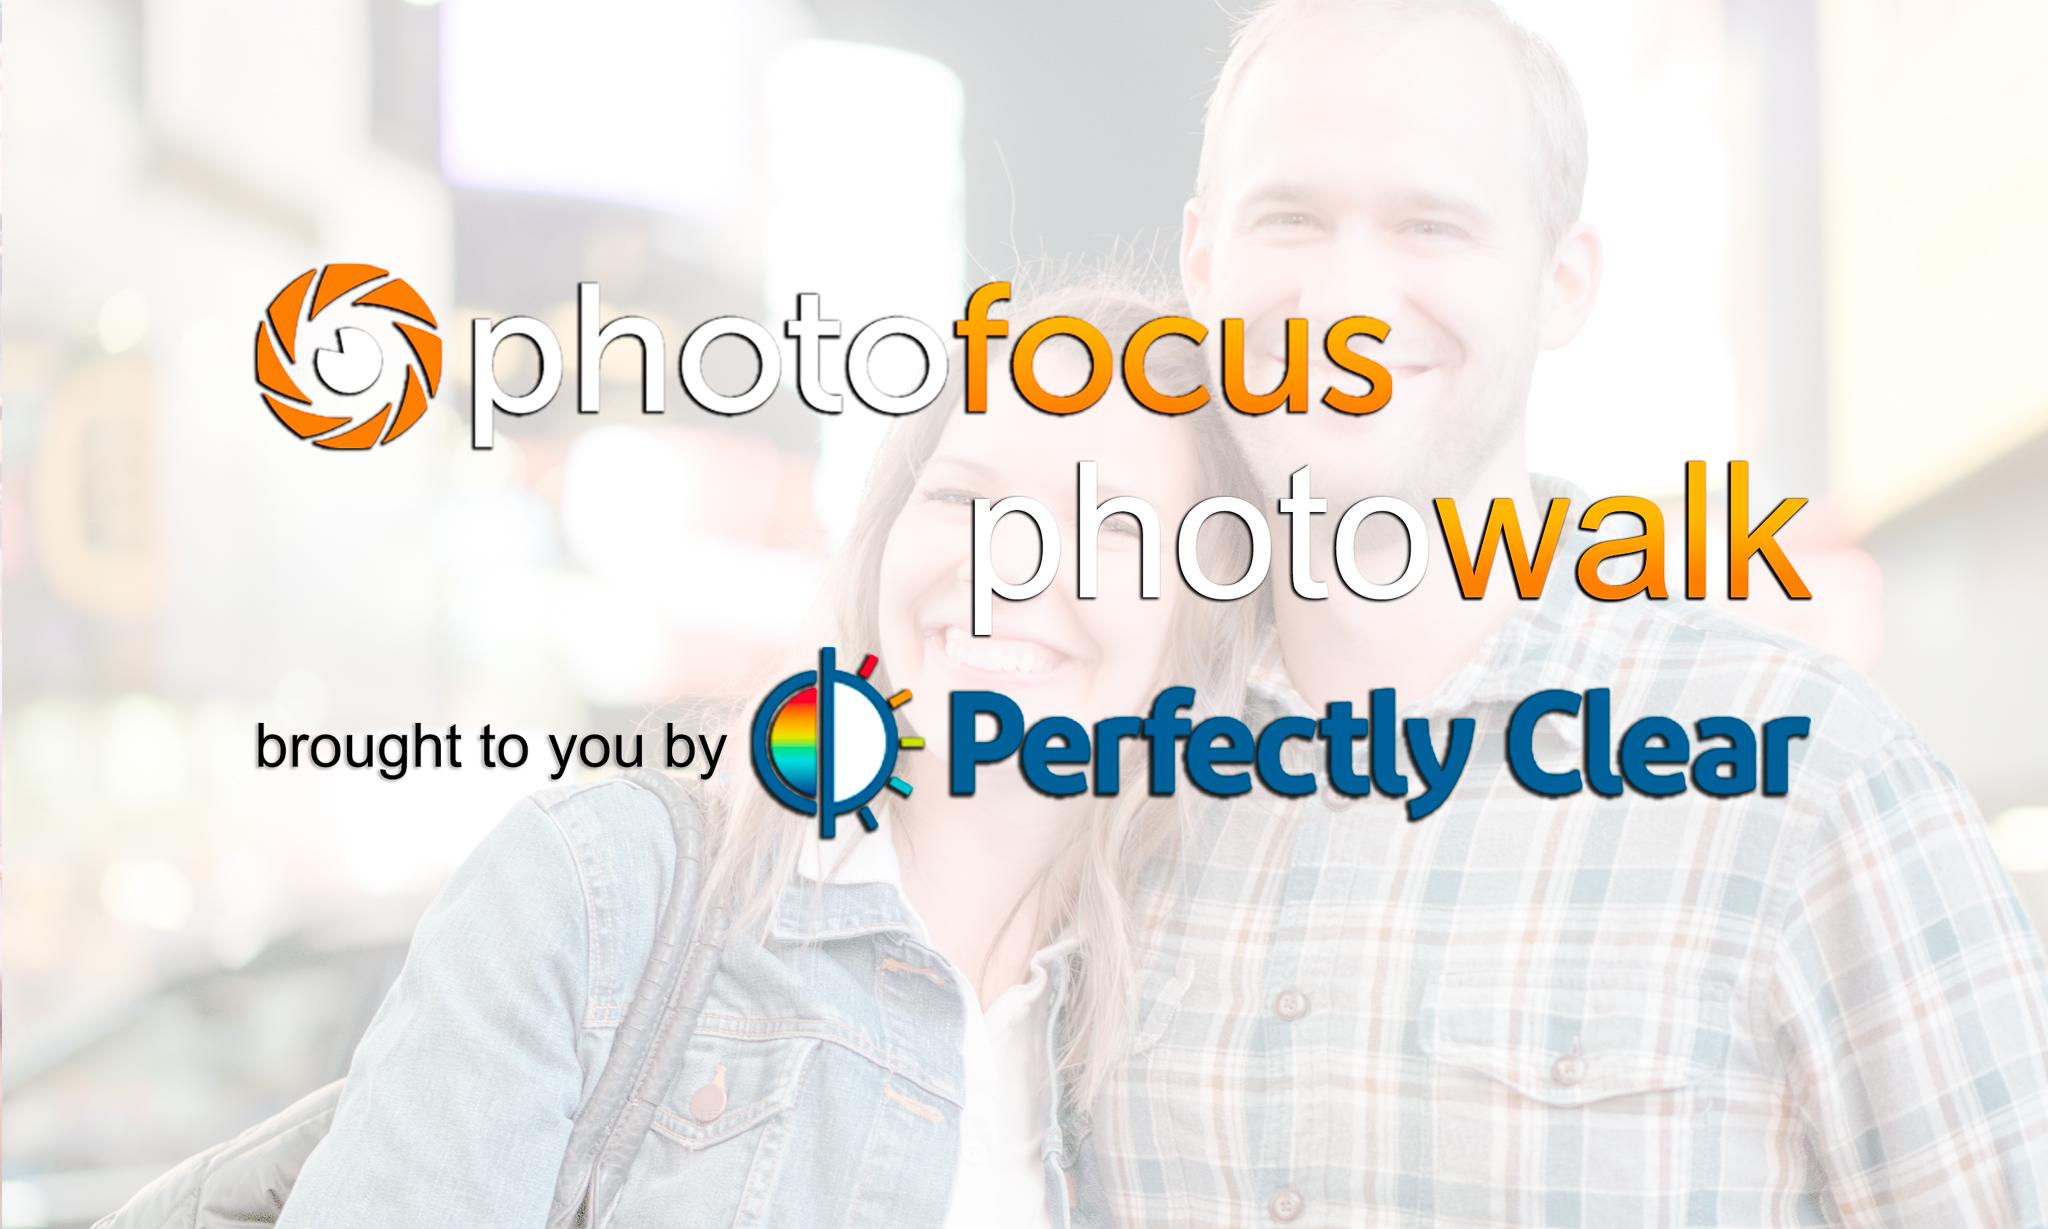 Photowalk PC